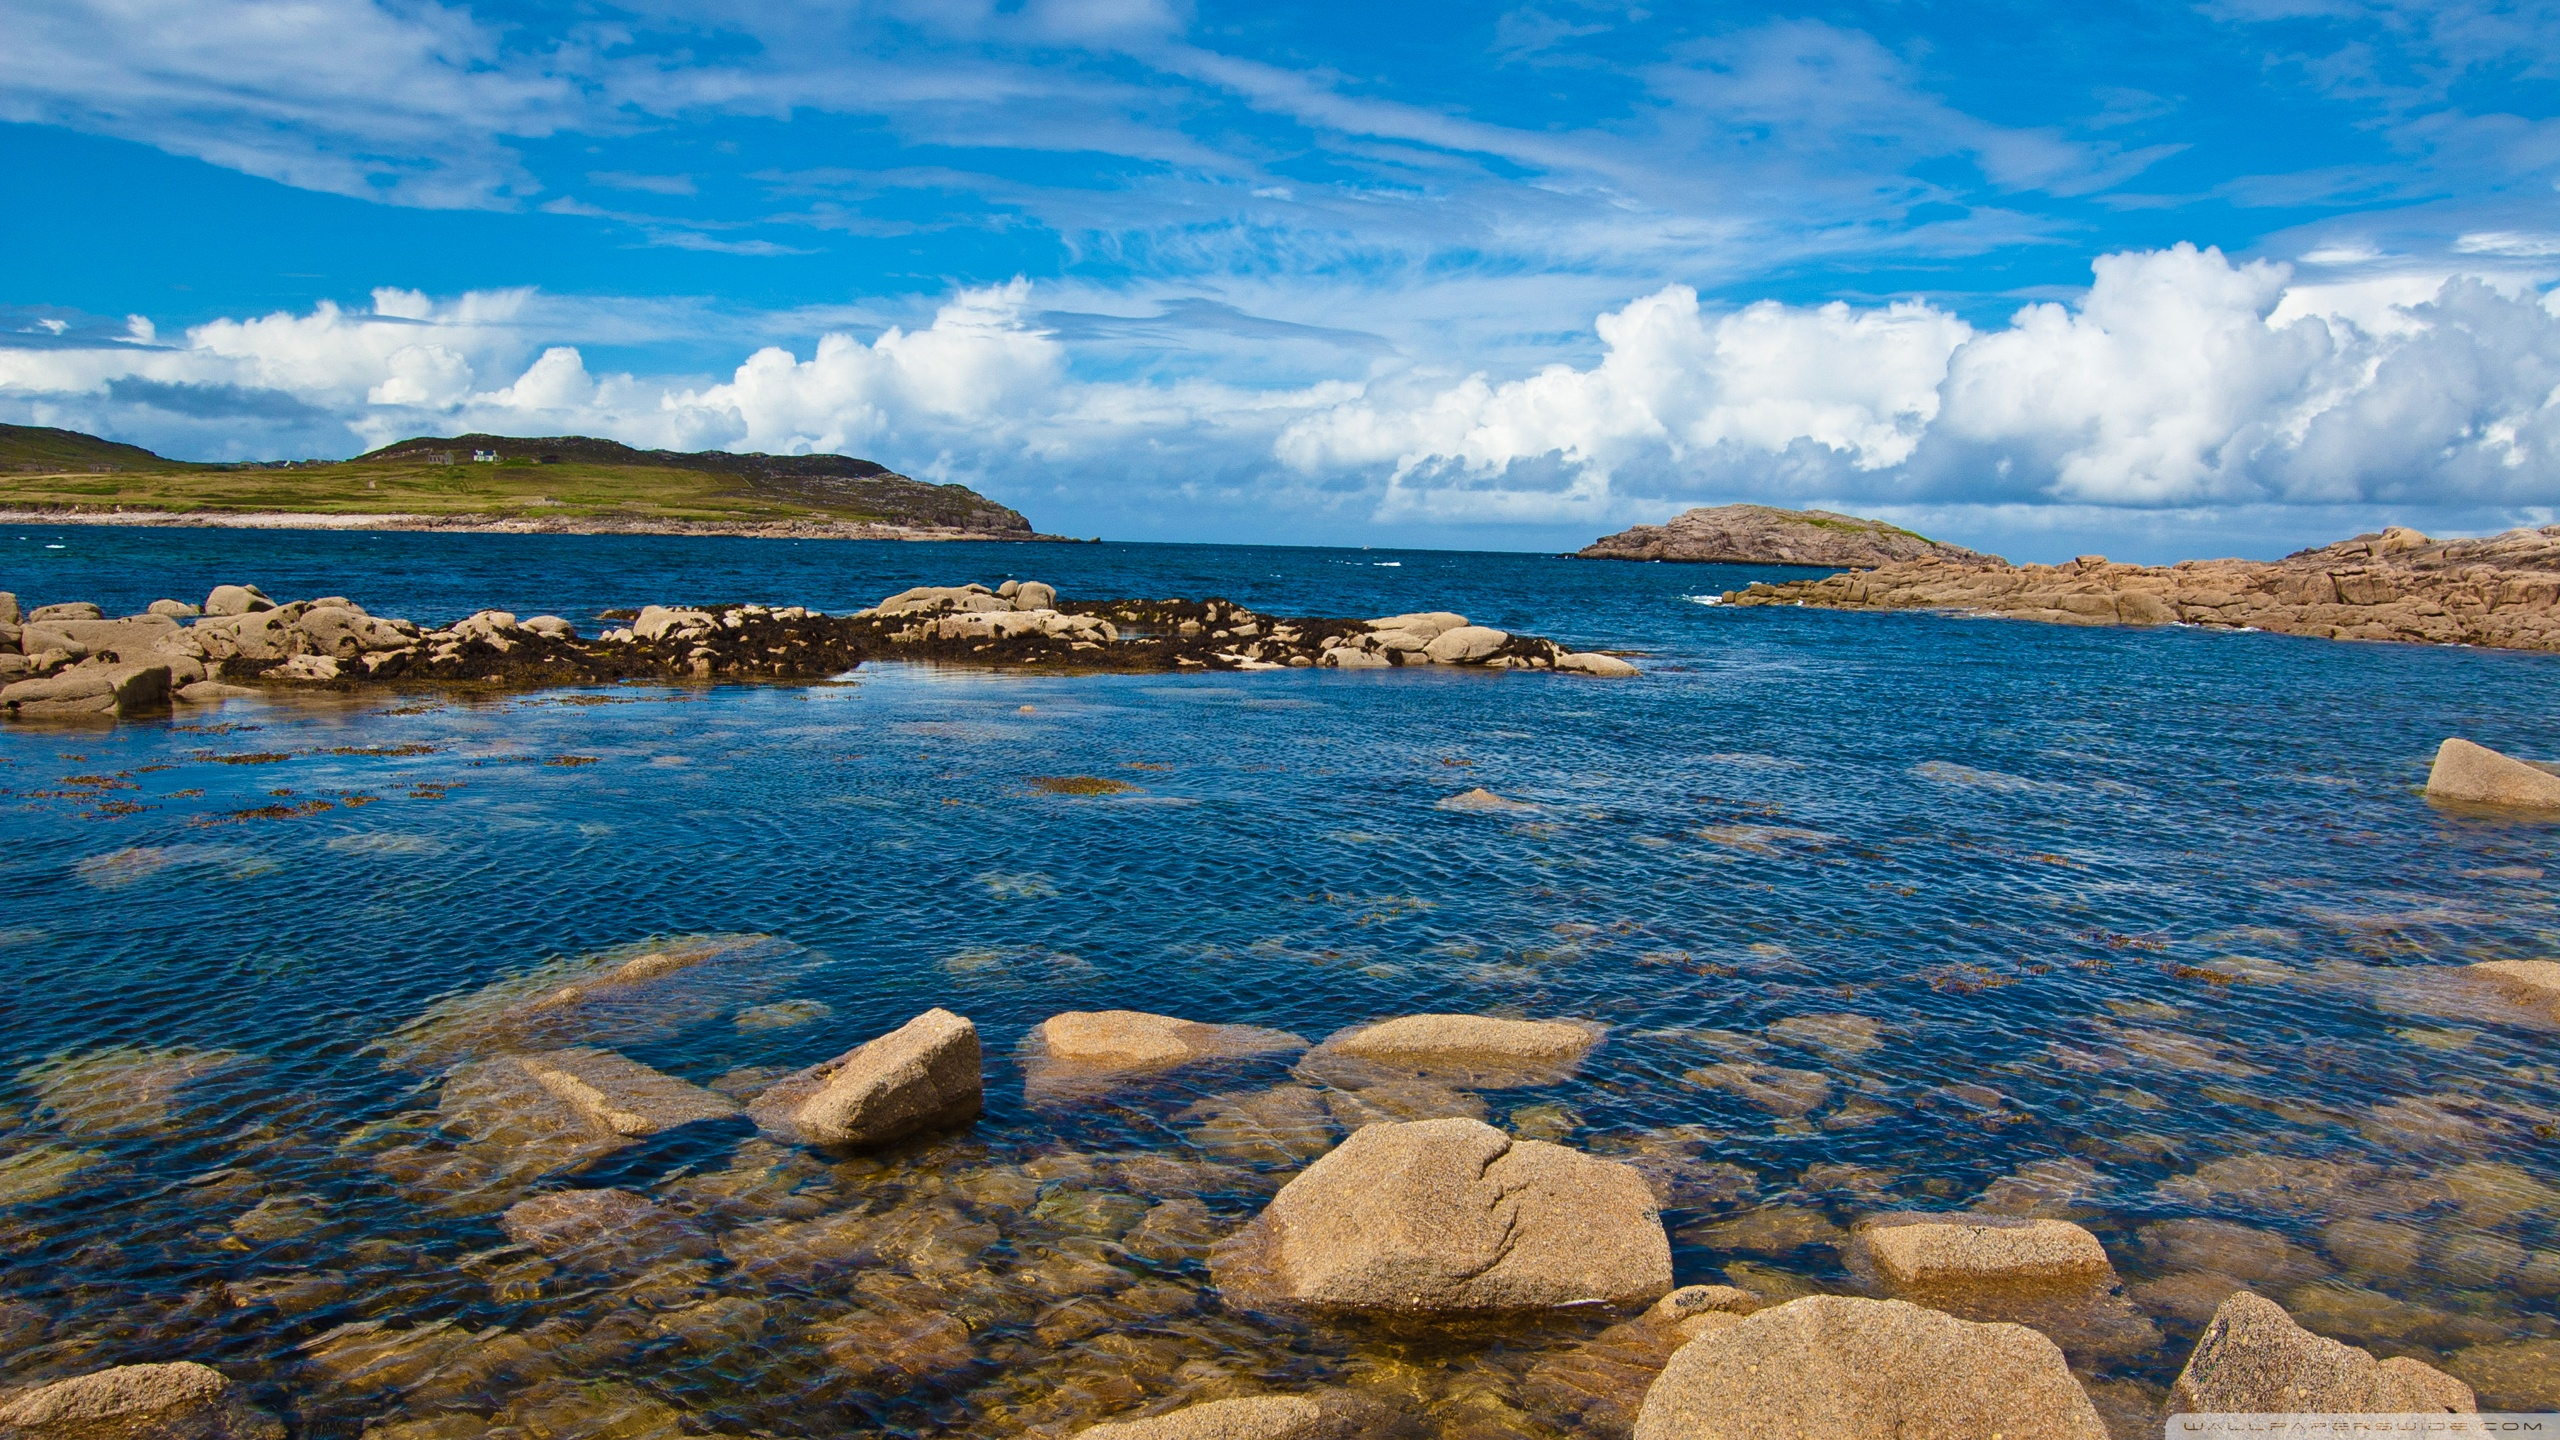 Atlantic Coast Cruit Island Donegal Ireland 4K HD Desktop 2560x1440